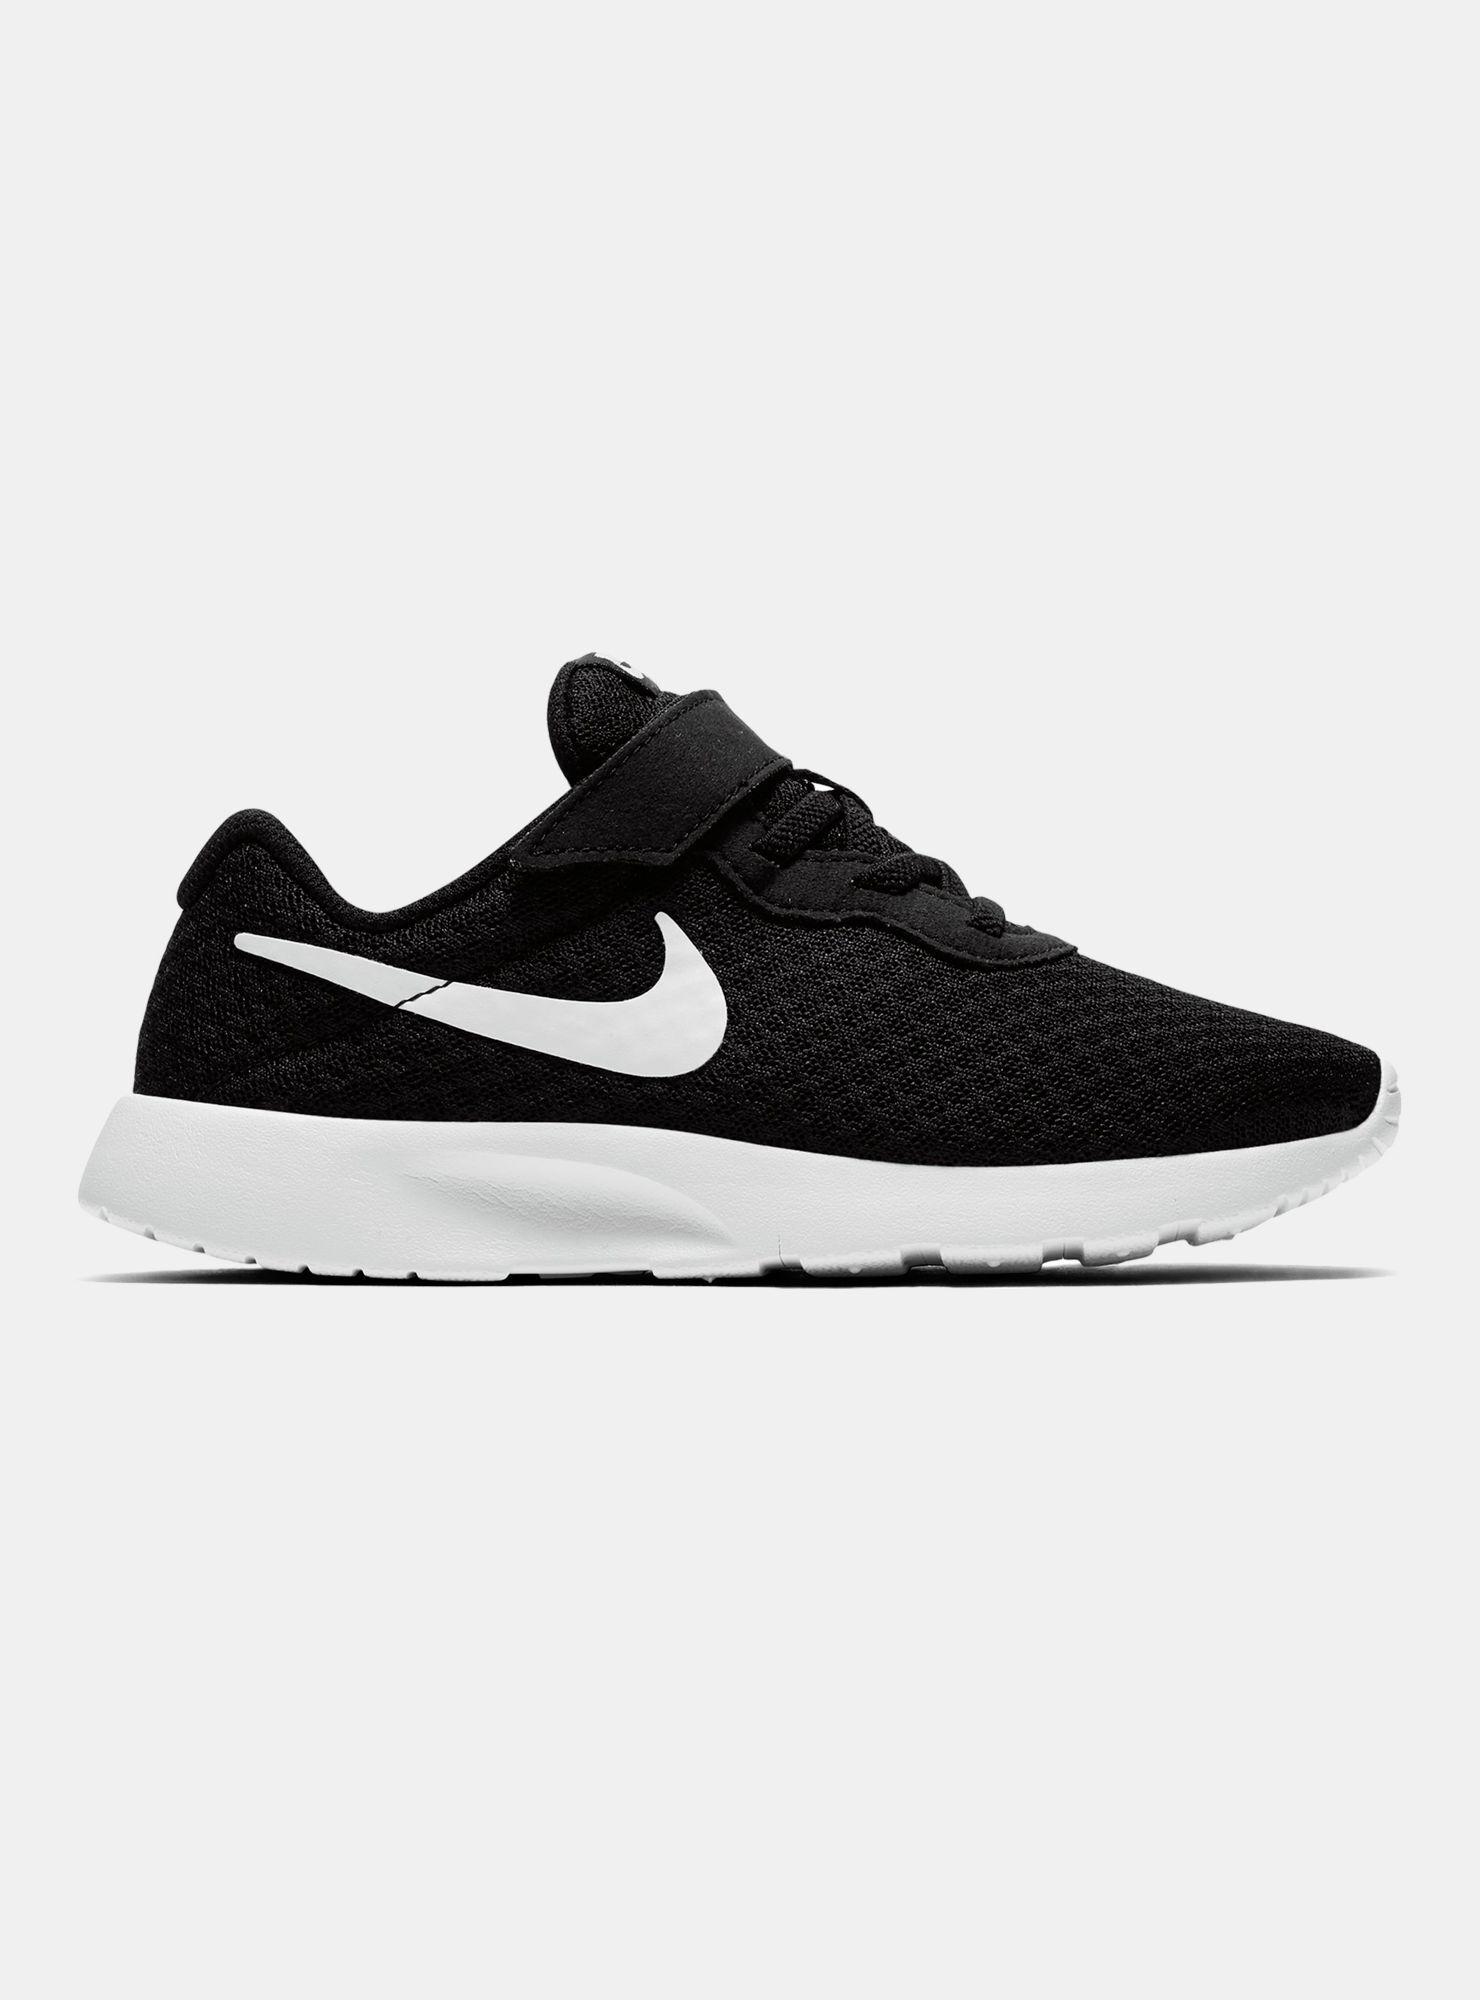 diseño atemporal 48fff a2409 Zapatilla Nike Tanjun Urbana Niña